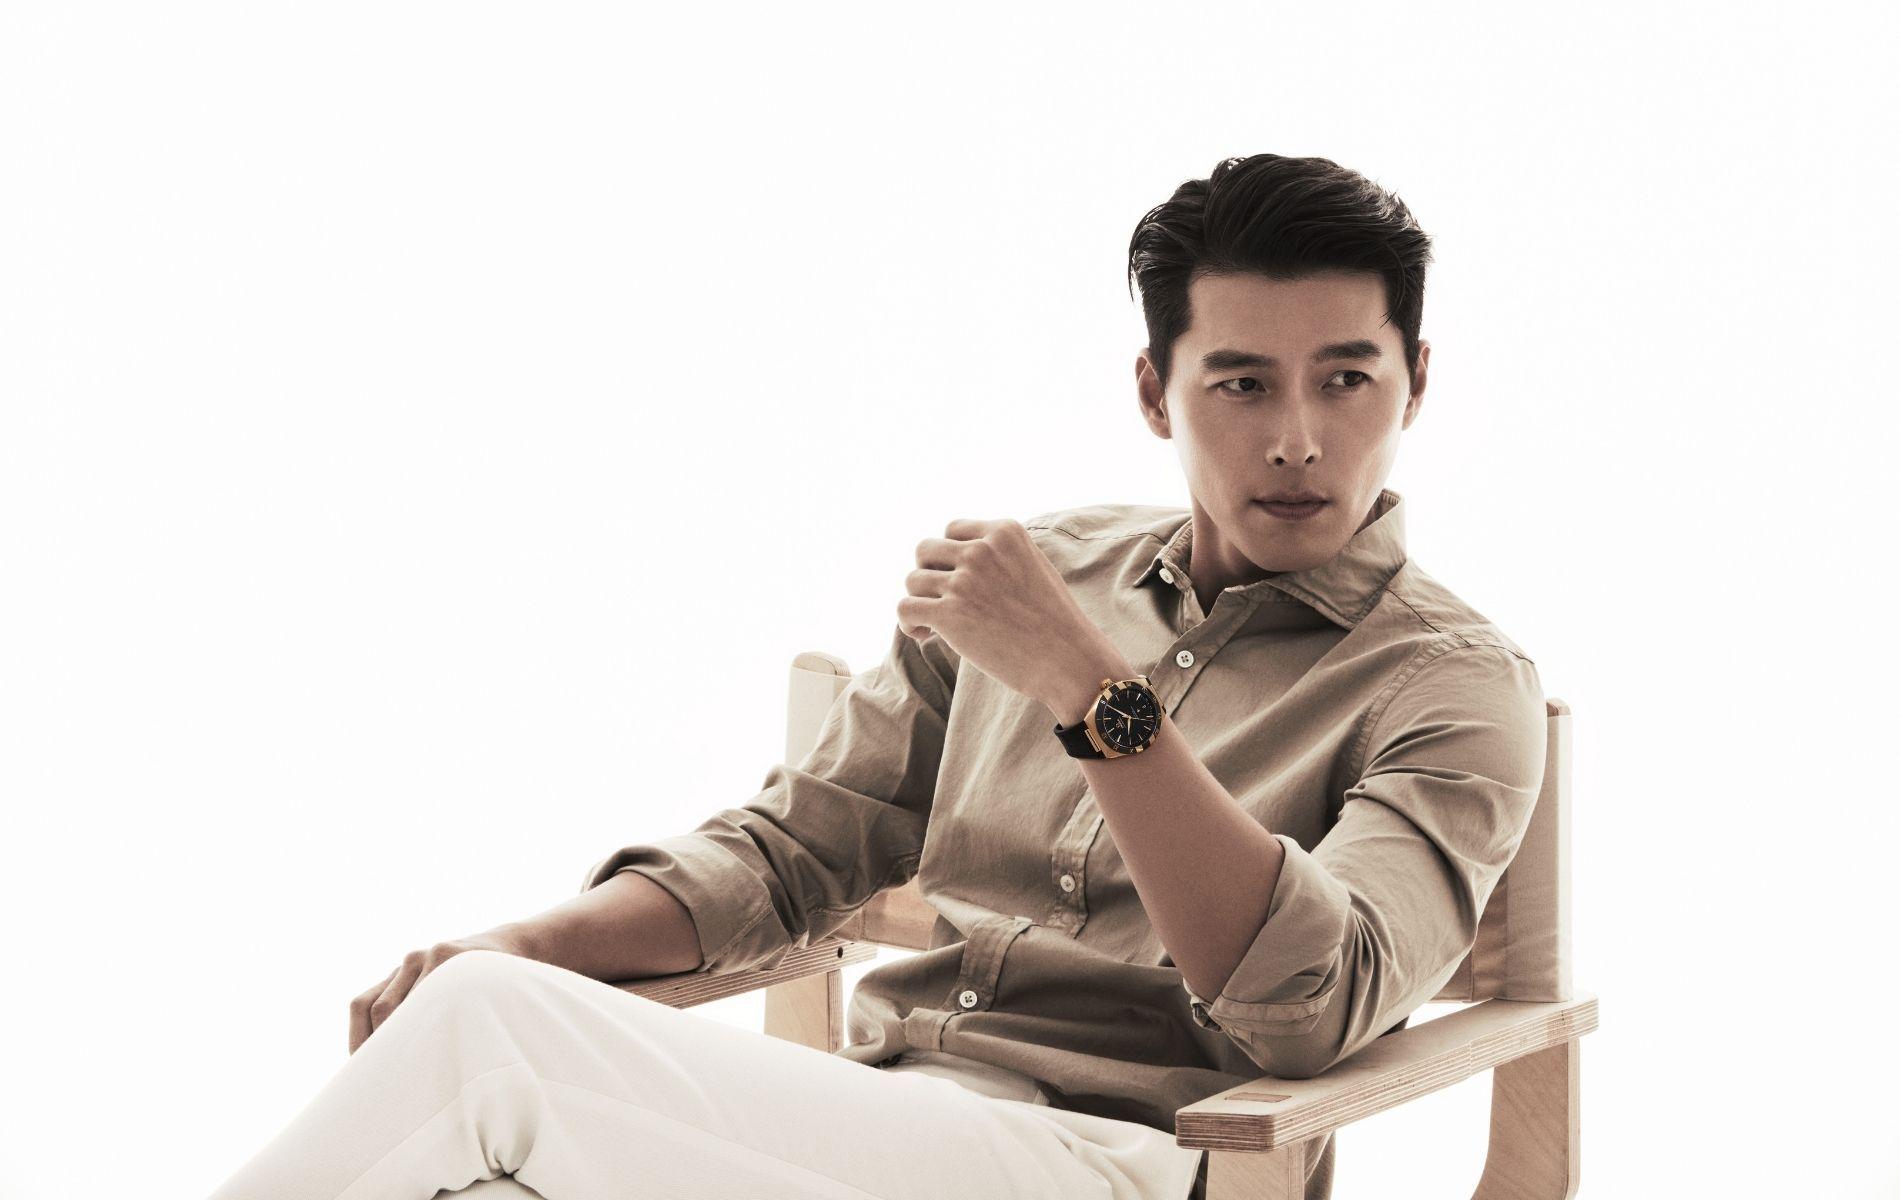 Hyun Bin, Star of Hit K-Drama Crash Landing on You, is Omega's Newest Ambassador